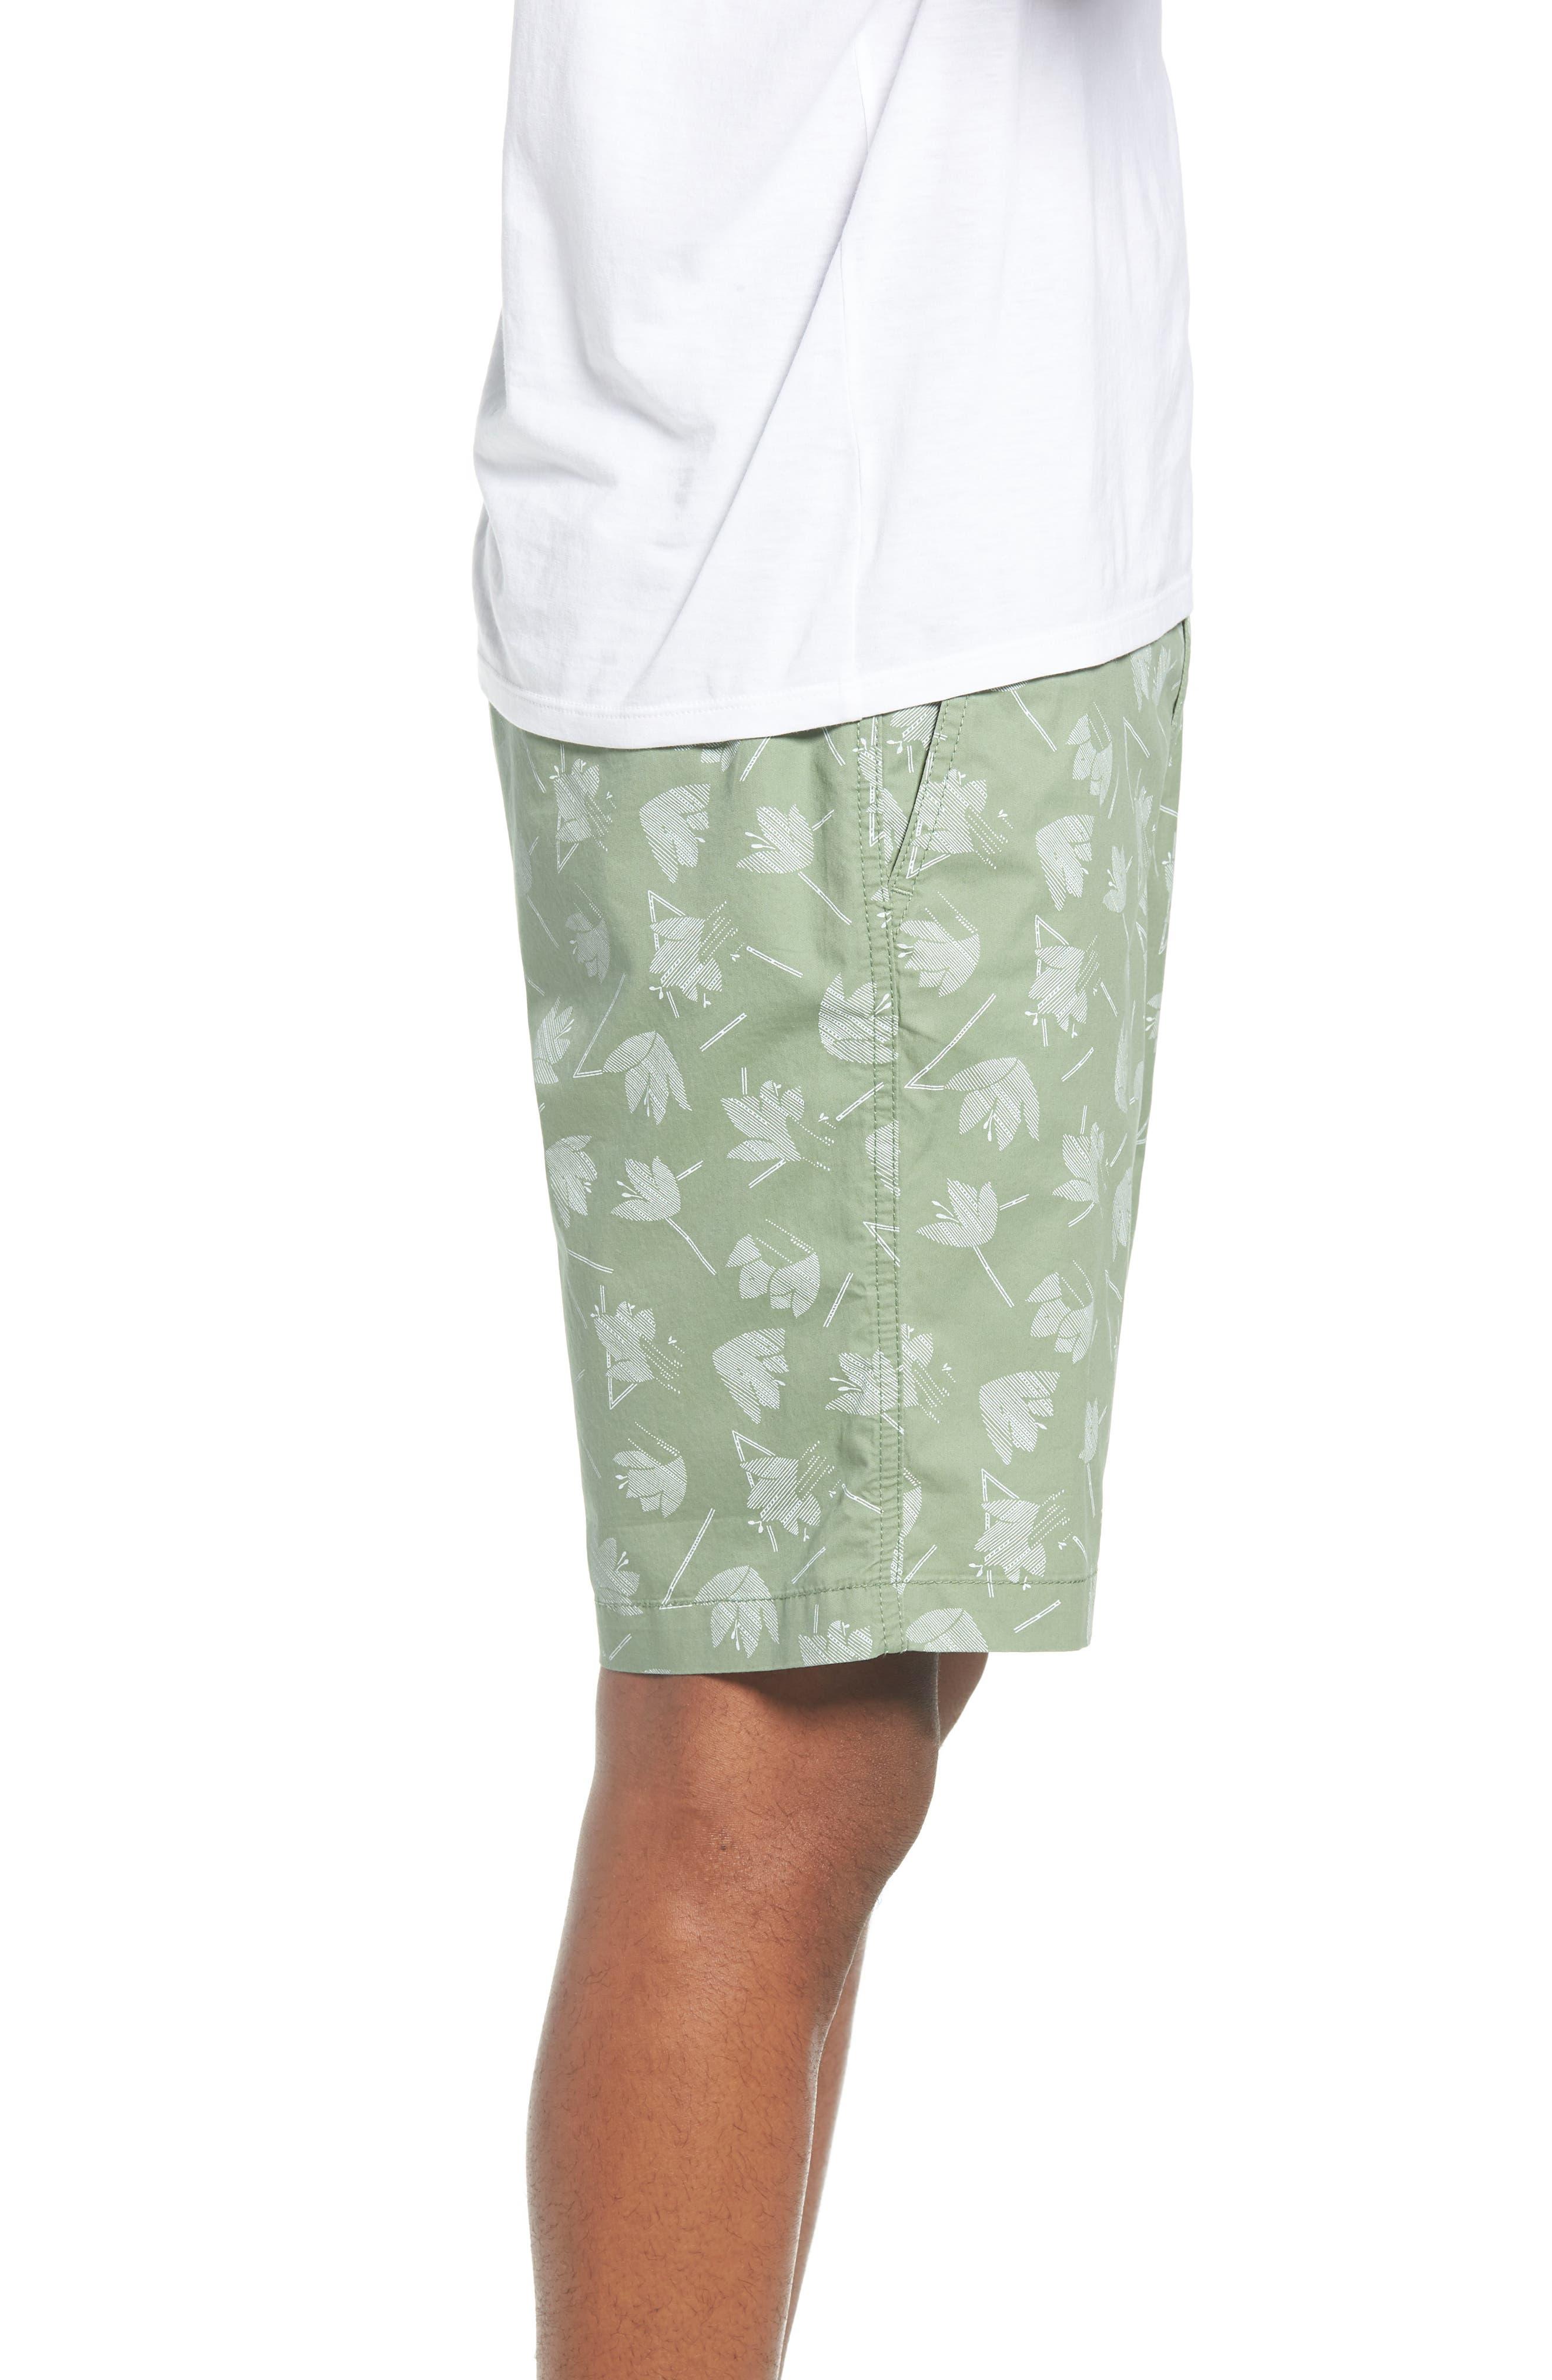 Deco Floral Print Shorts,                             Alternate thumbnail 3, color,                             Green Hedge Deco Floral